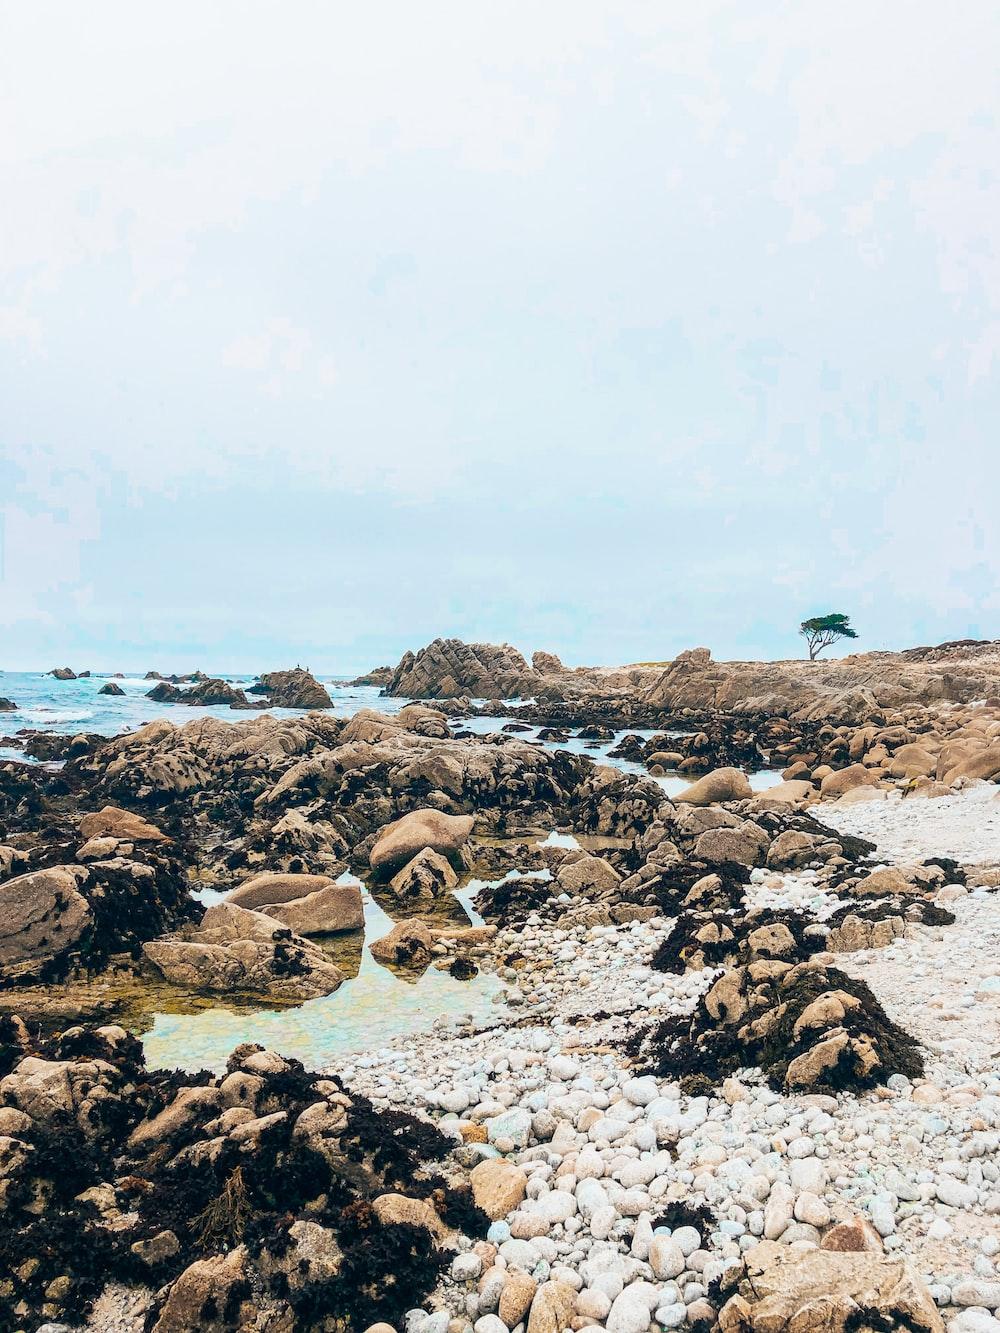 brown rocks on beach during daytime